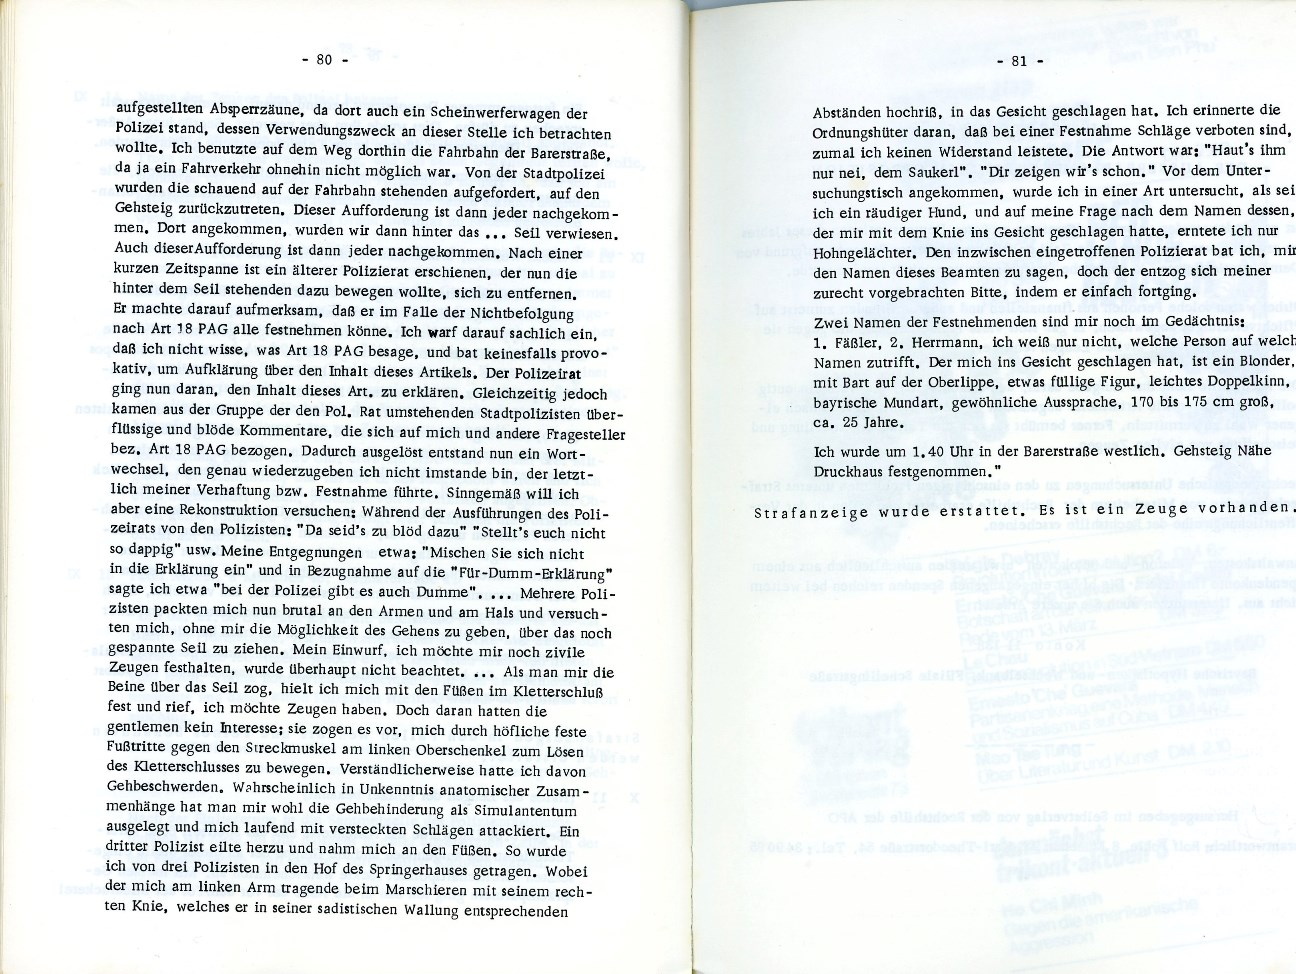 Muenchen_Doku_Osterdemonstrationen_1968_43